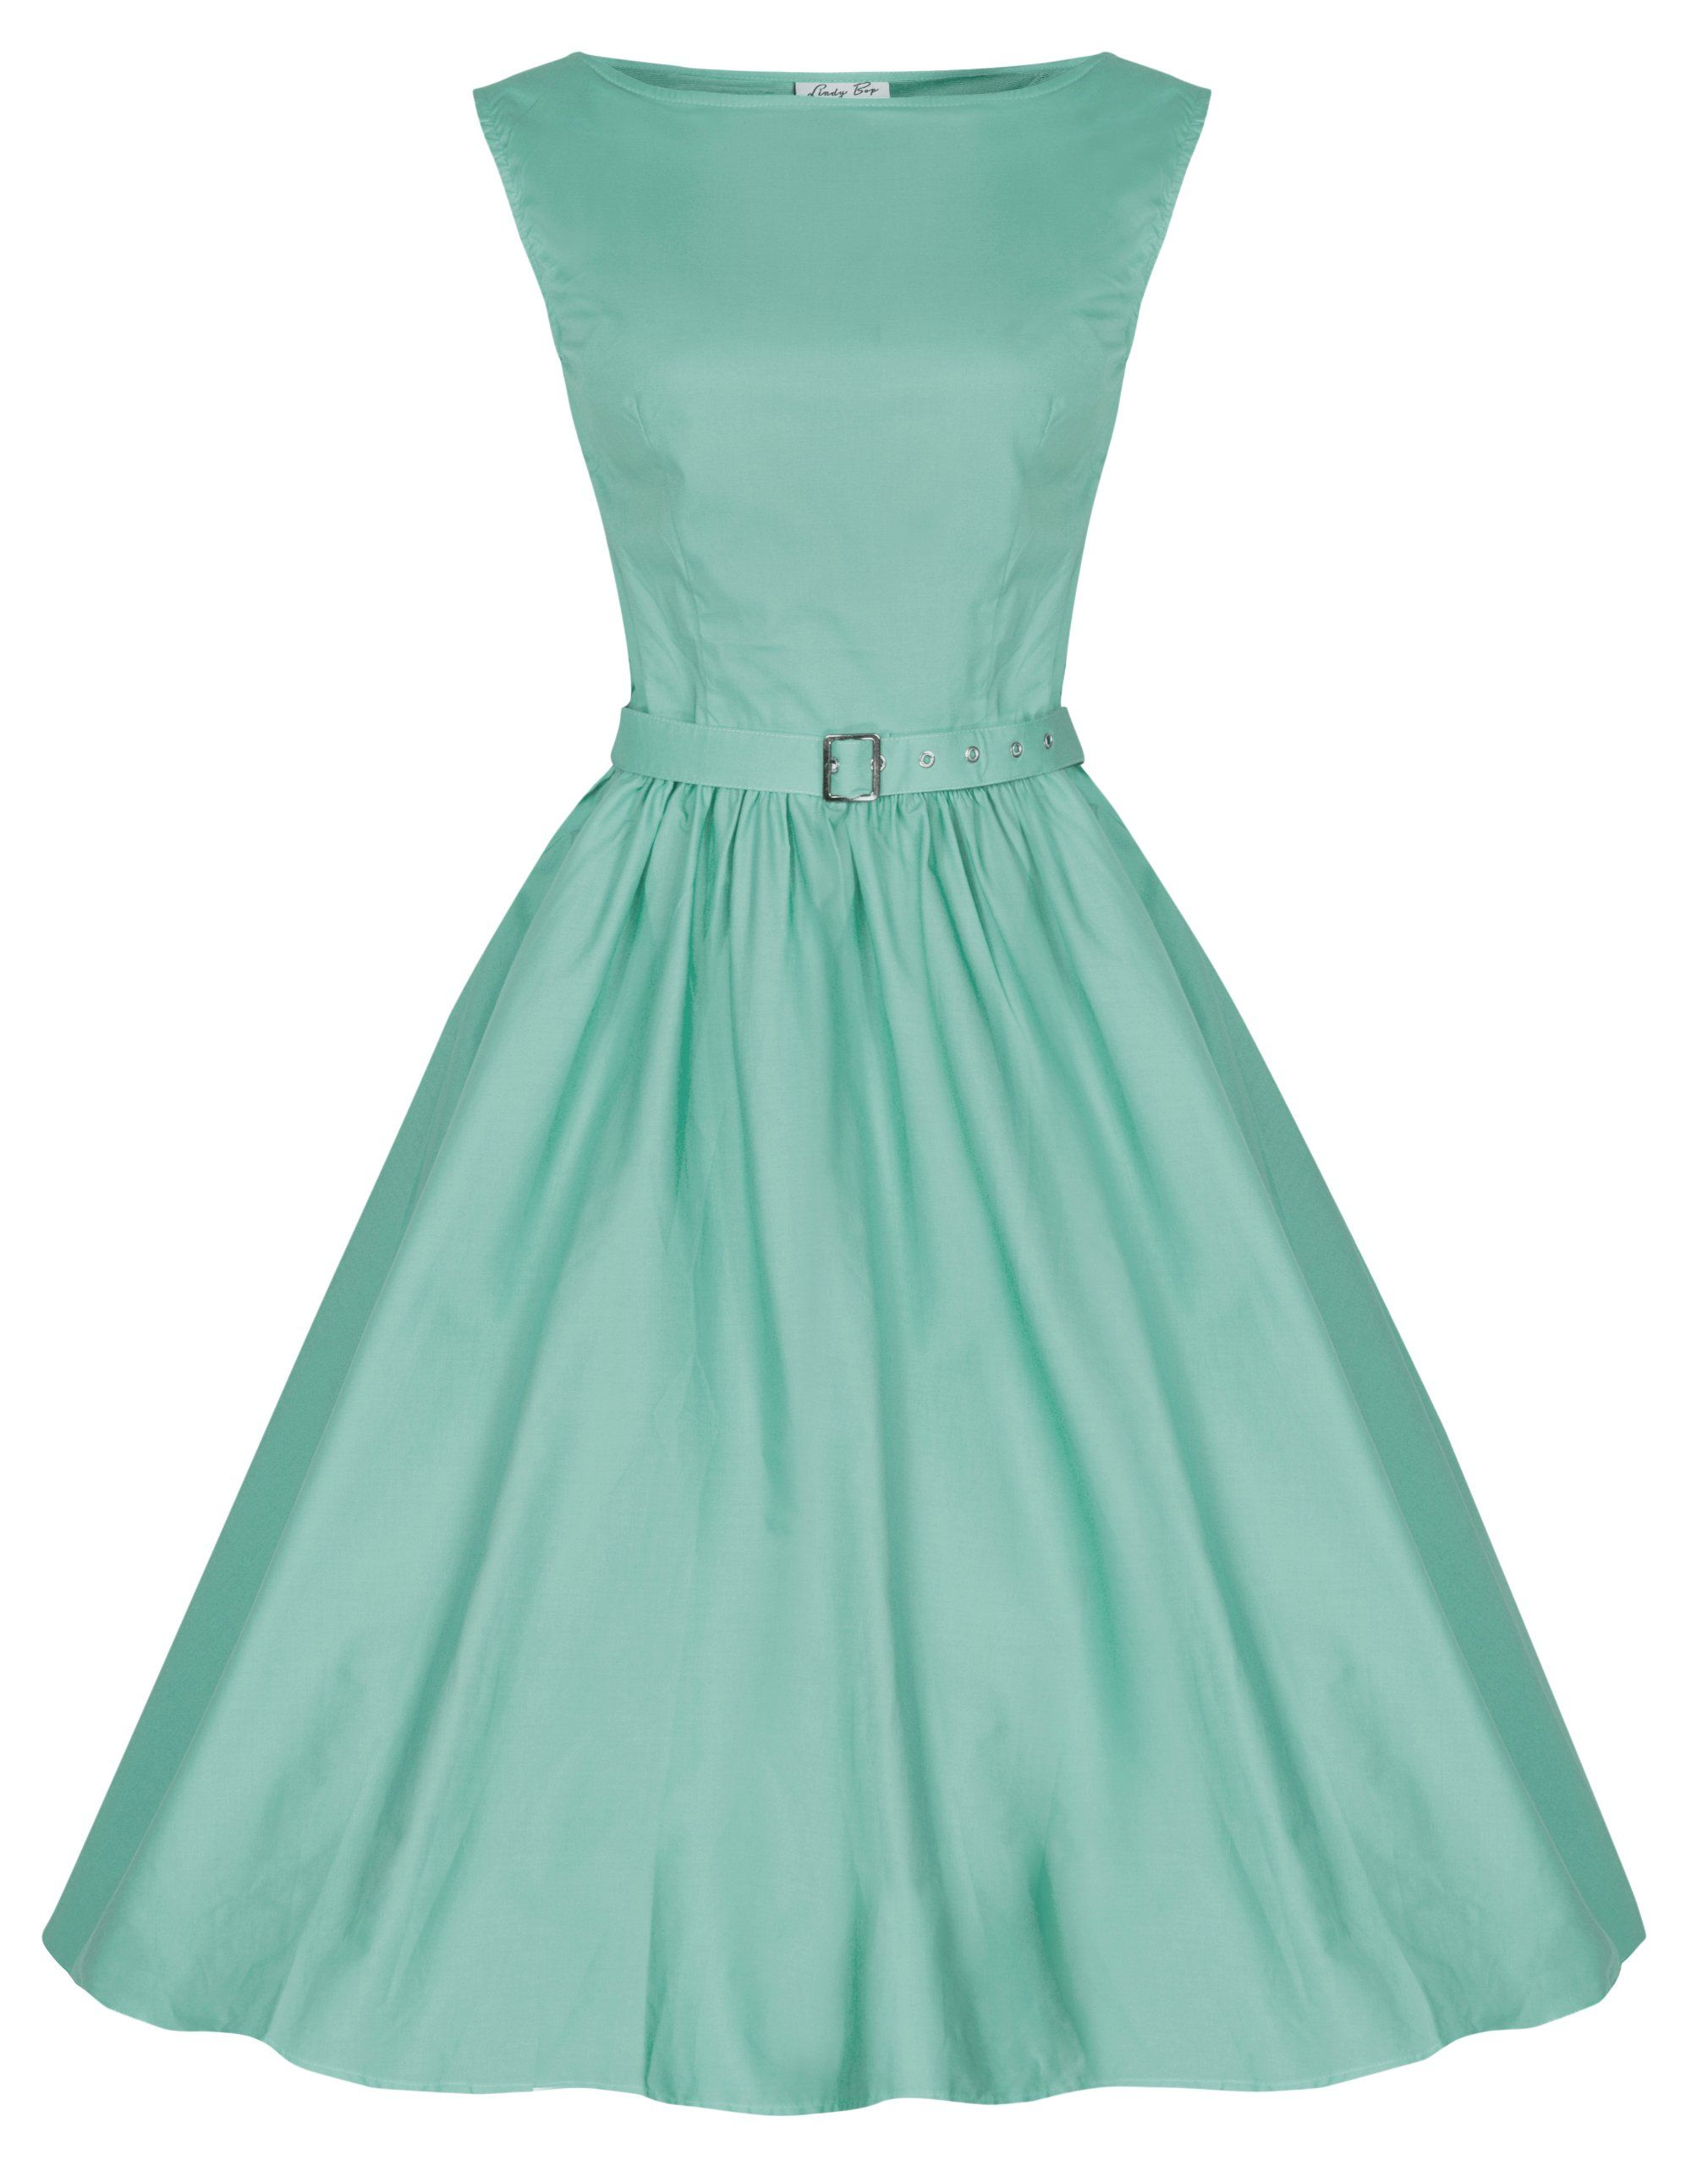 Lindy Bop \'Audrey\' Hepburn Style Vintage 1950\'s Pastel Rockabilly ...